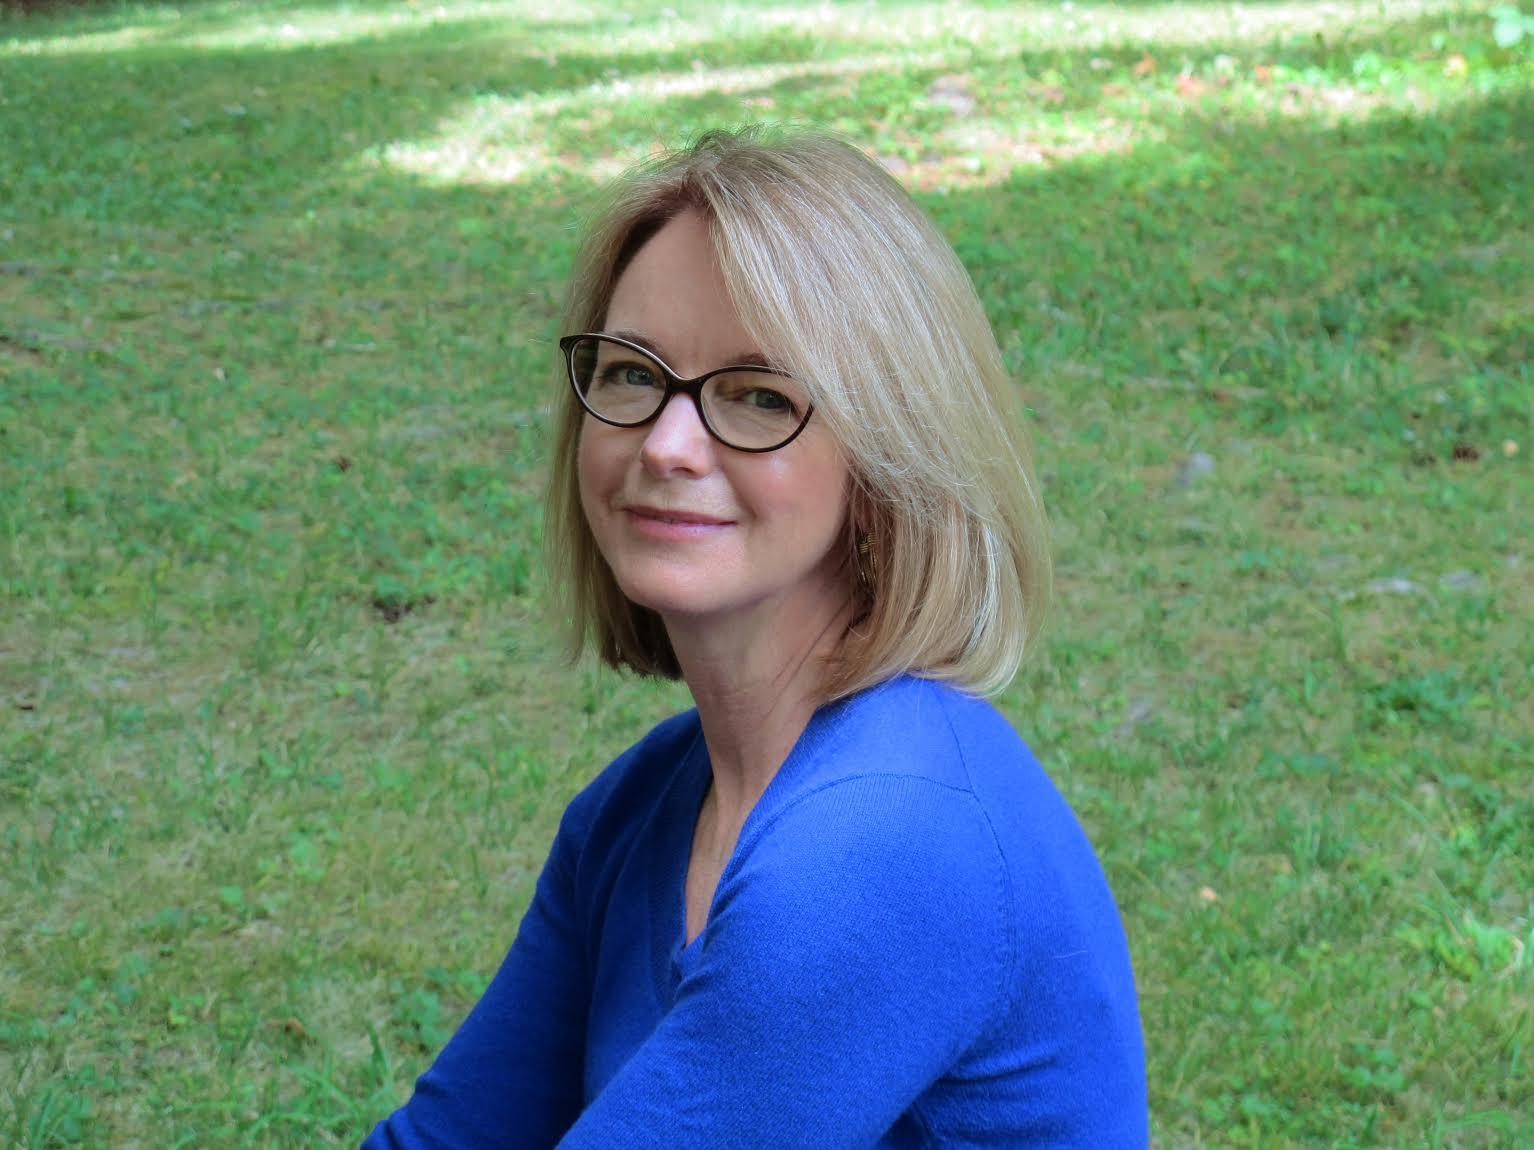 Elaine Khosrova, author of Butter: A Rich History. All photos by or courtesy of Elaine Khosrova.